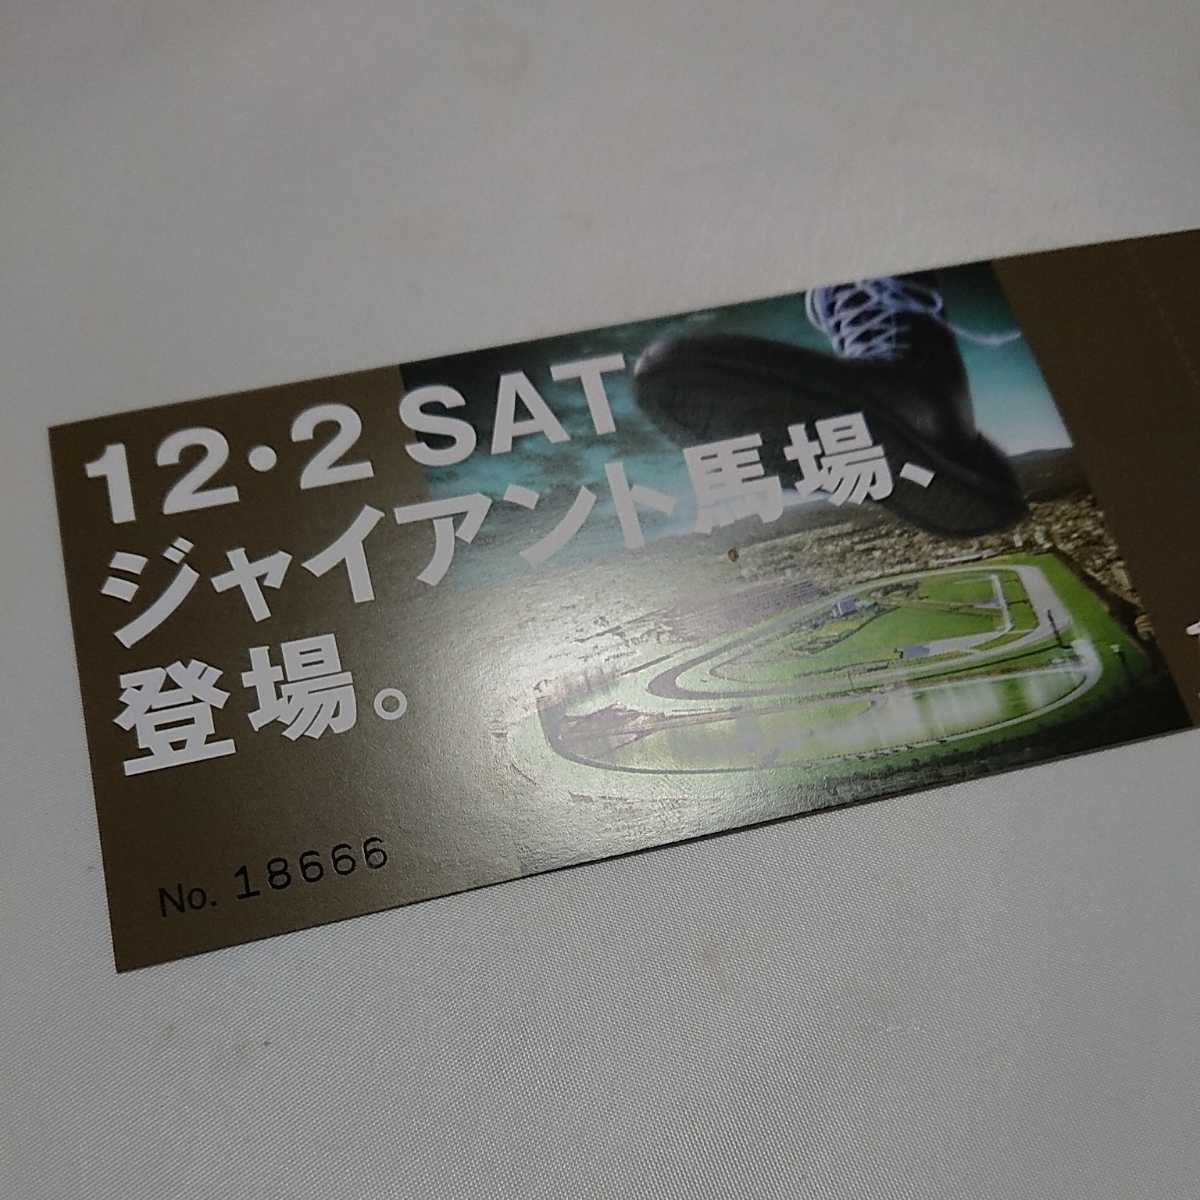 JRA 阪神競馬場 平成18年12月2日限定 入場券 ジャイアント馬場、登場